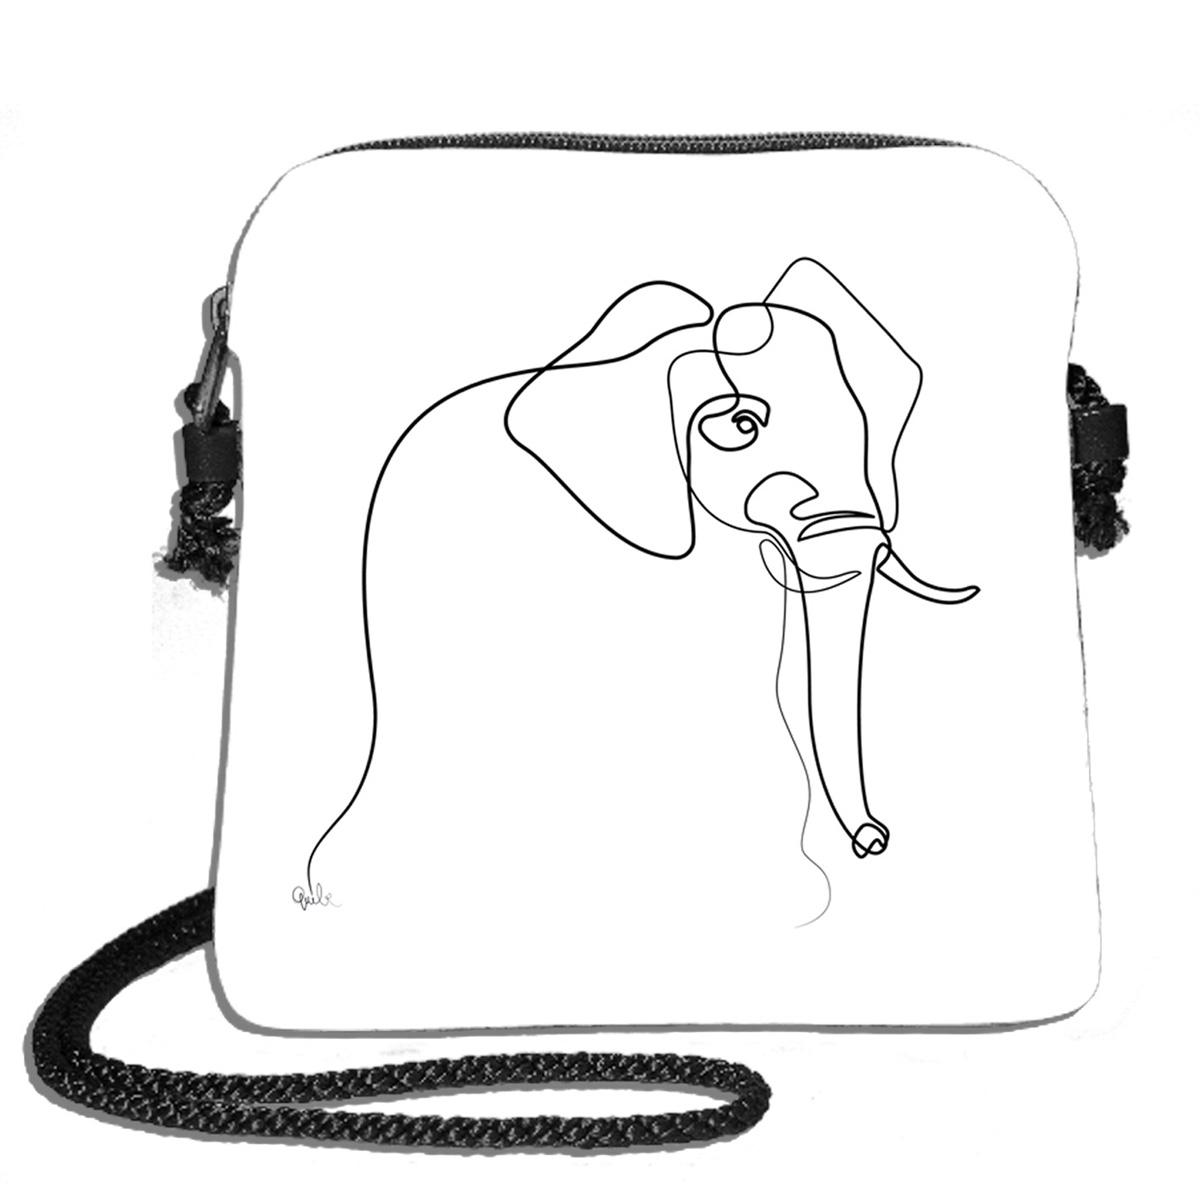 Sac bandoulière artisanal \'Quibe\' blanc noir (Elephant)  - 18x17 cm - [A0336]